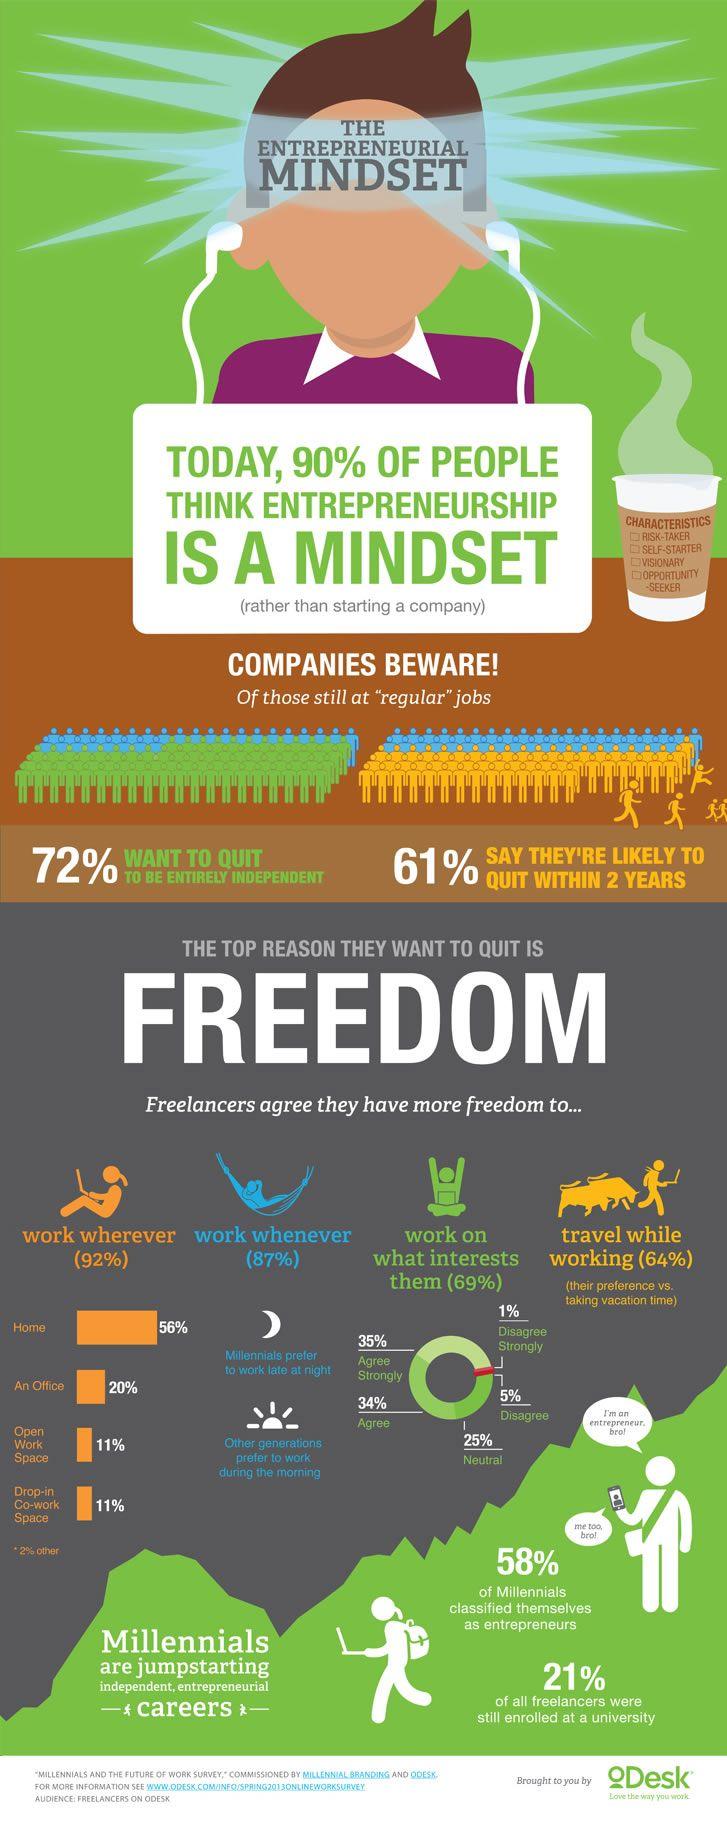 Intra premiership & Millennials odesk-infographic